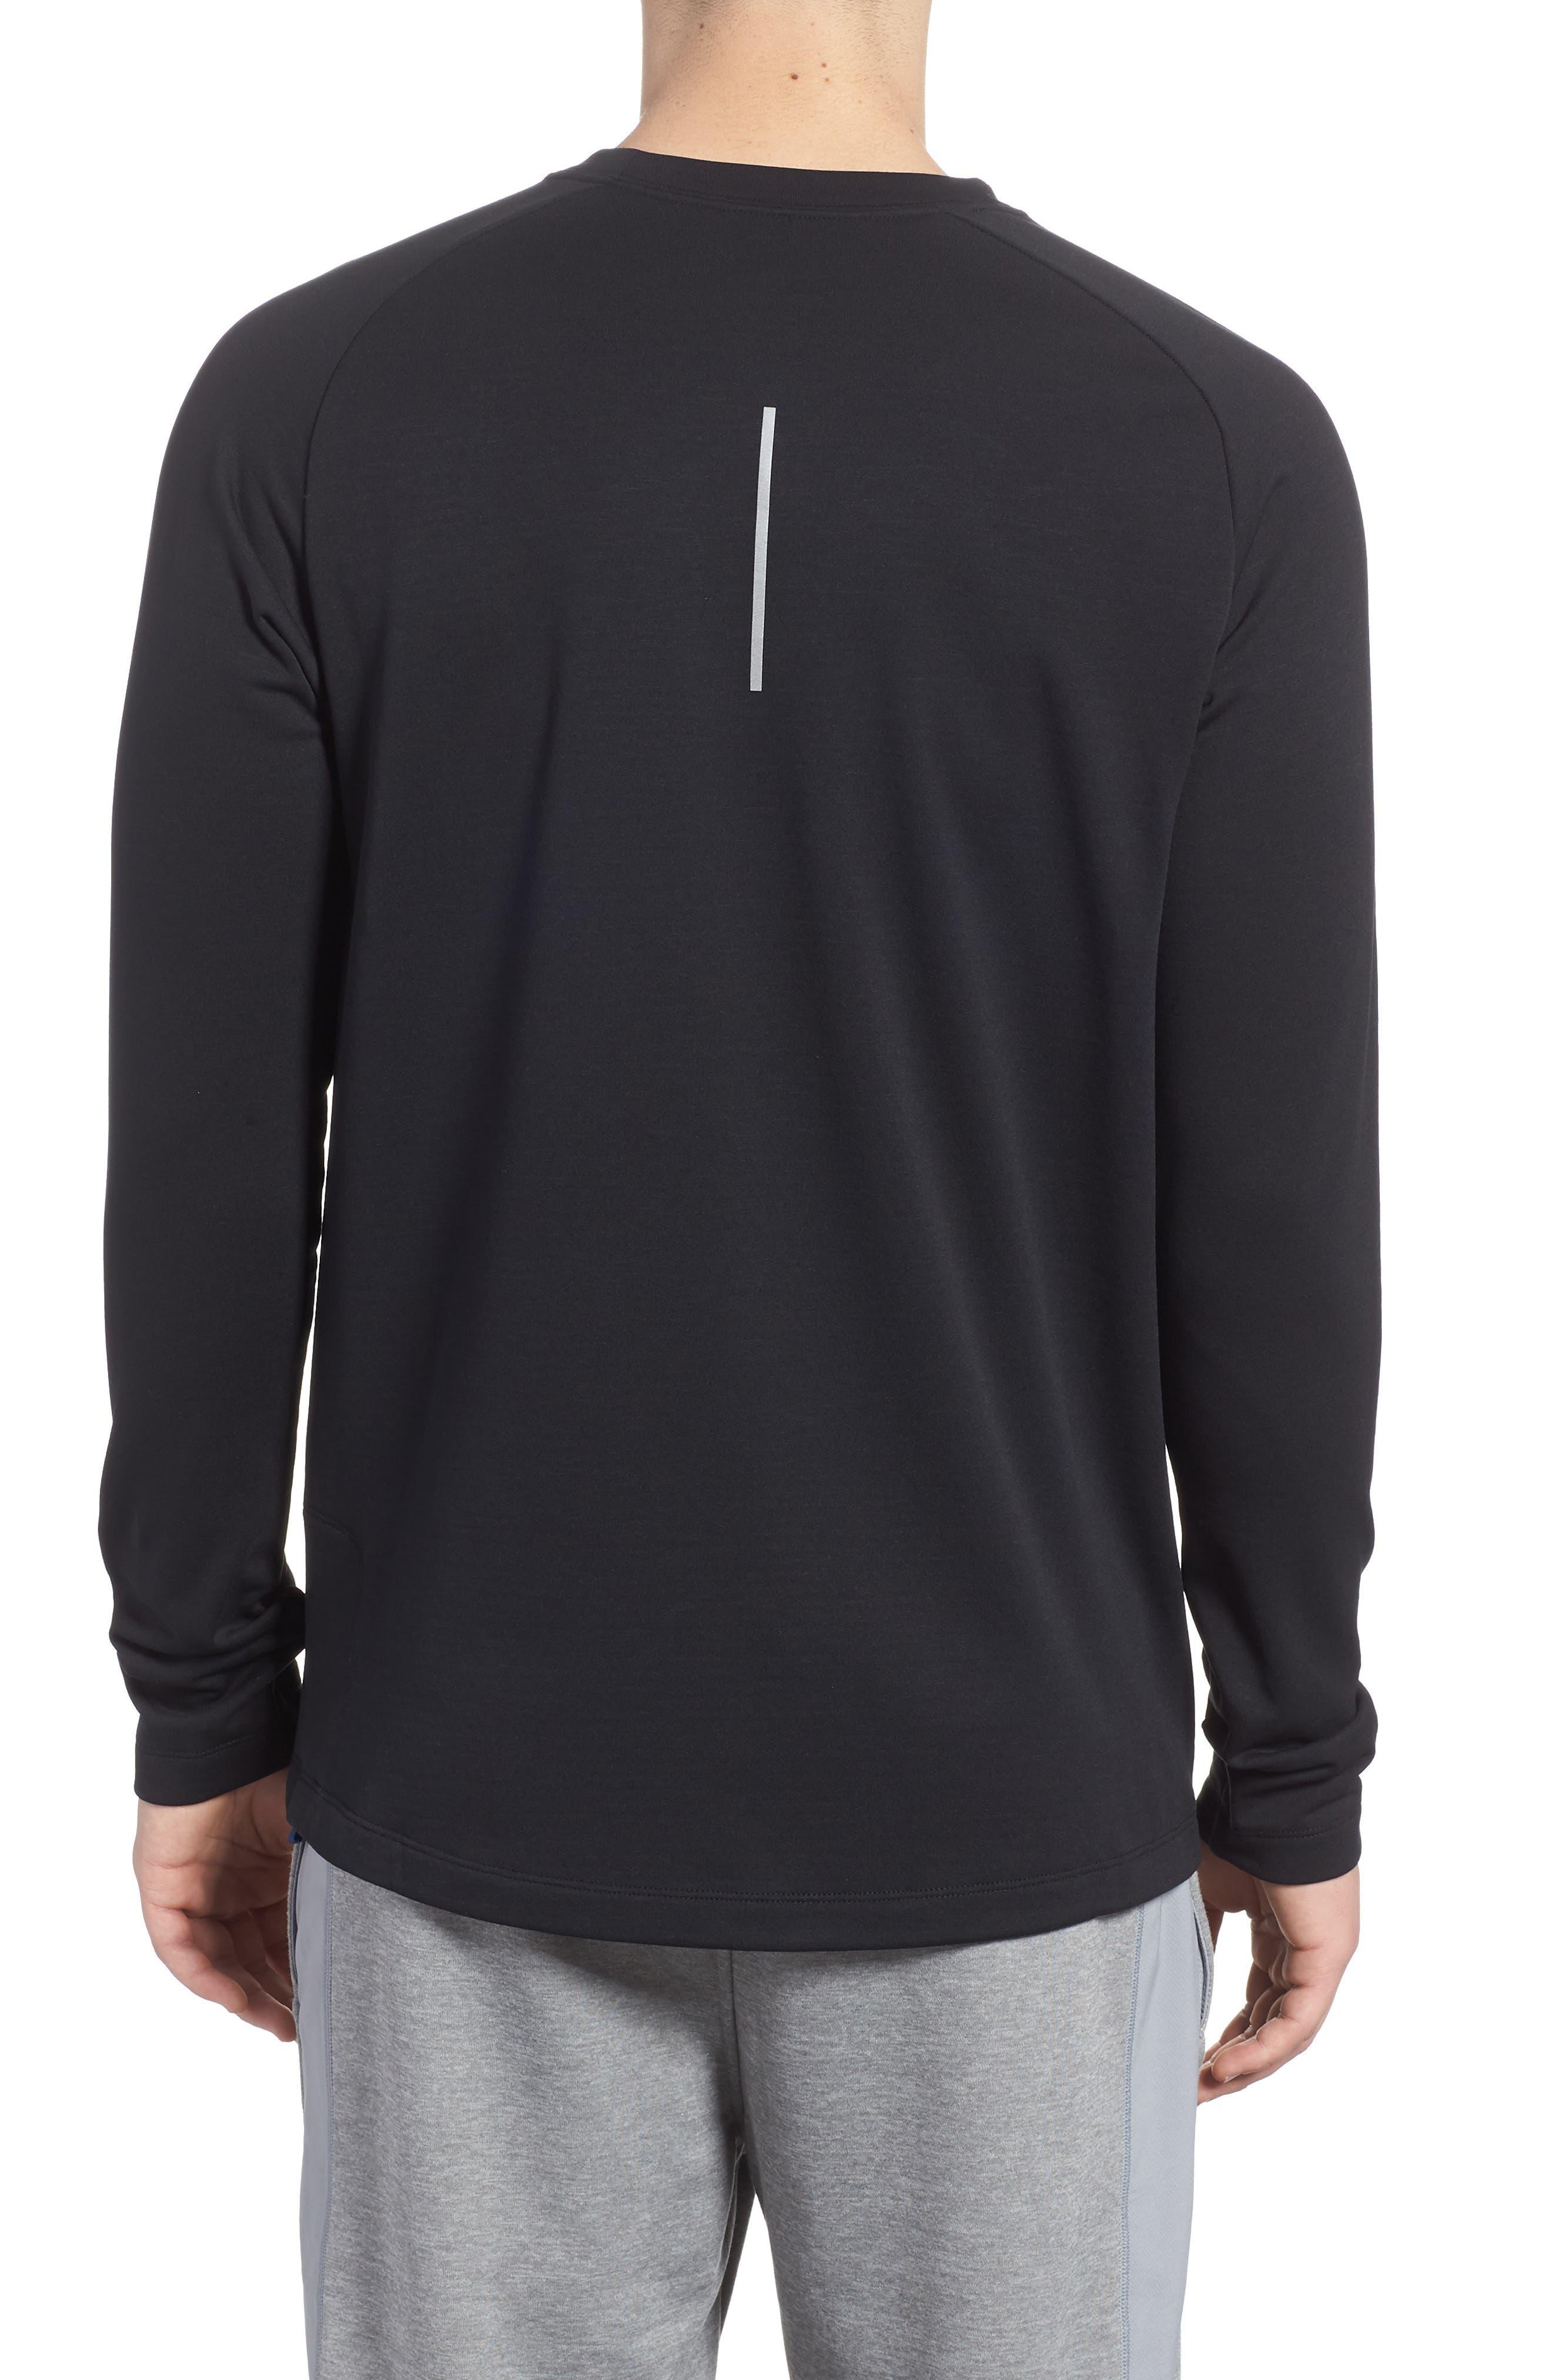 Running Element Long Sleeve T-Shirt,                             Alternate thumbnail 2, color,                             Black